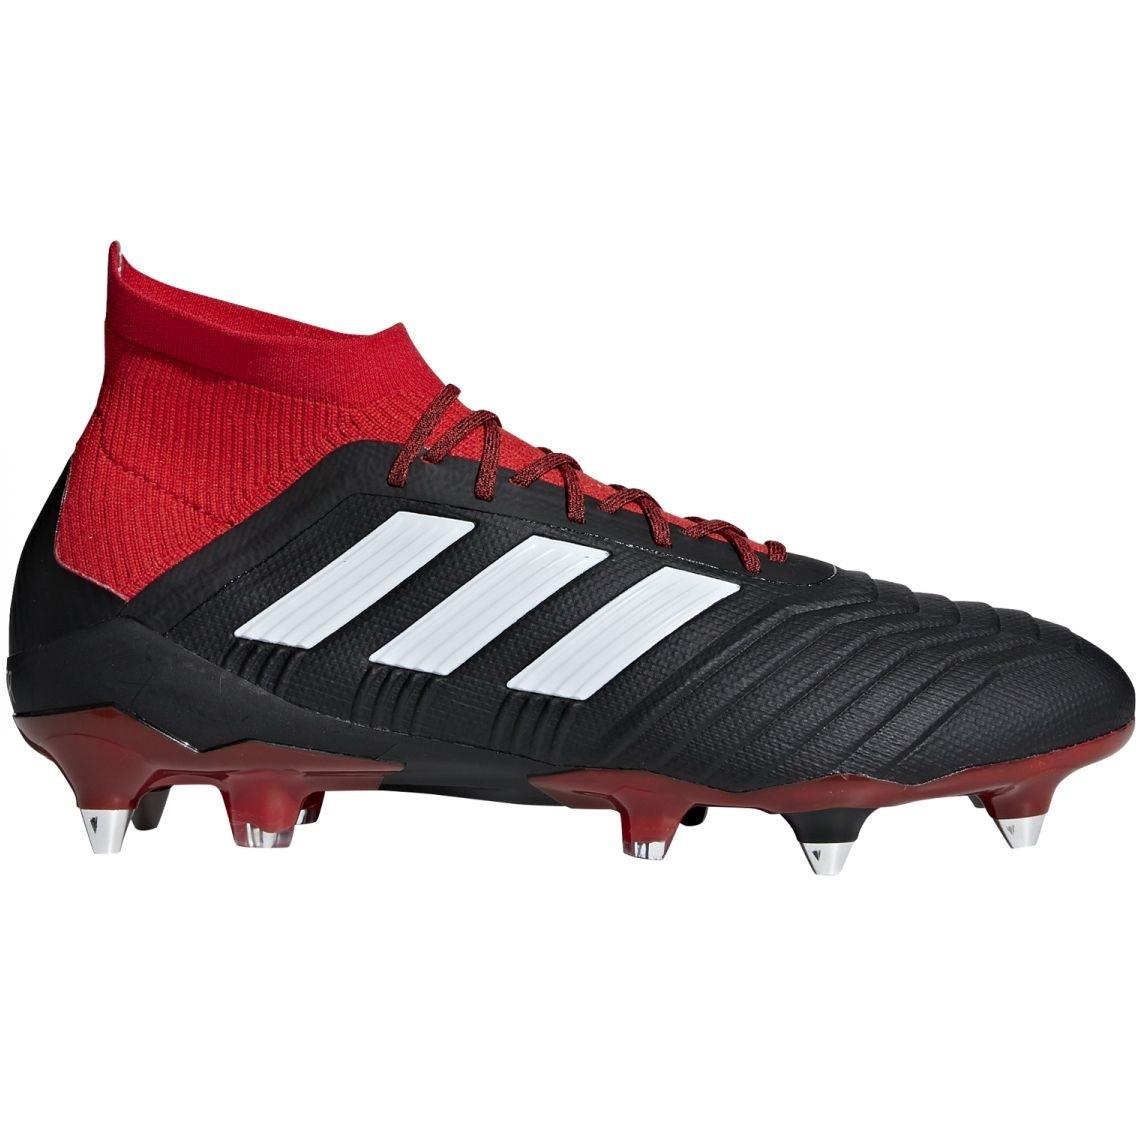 adidas Predator 18.1 SG Fußballschuhe